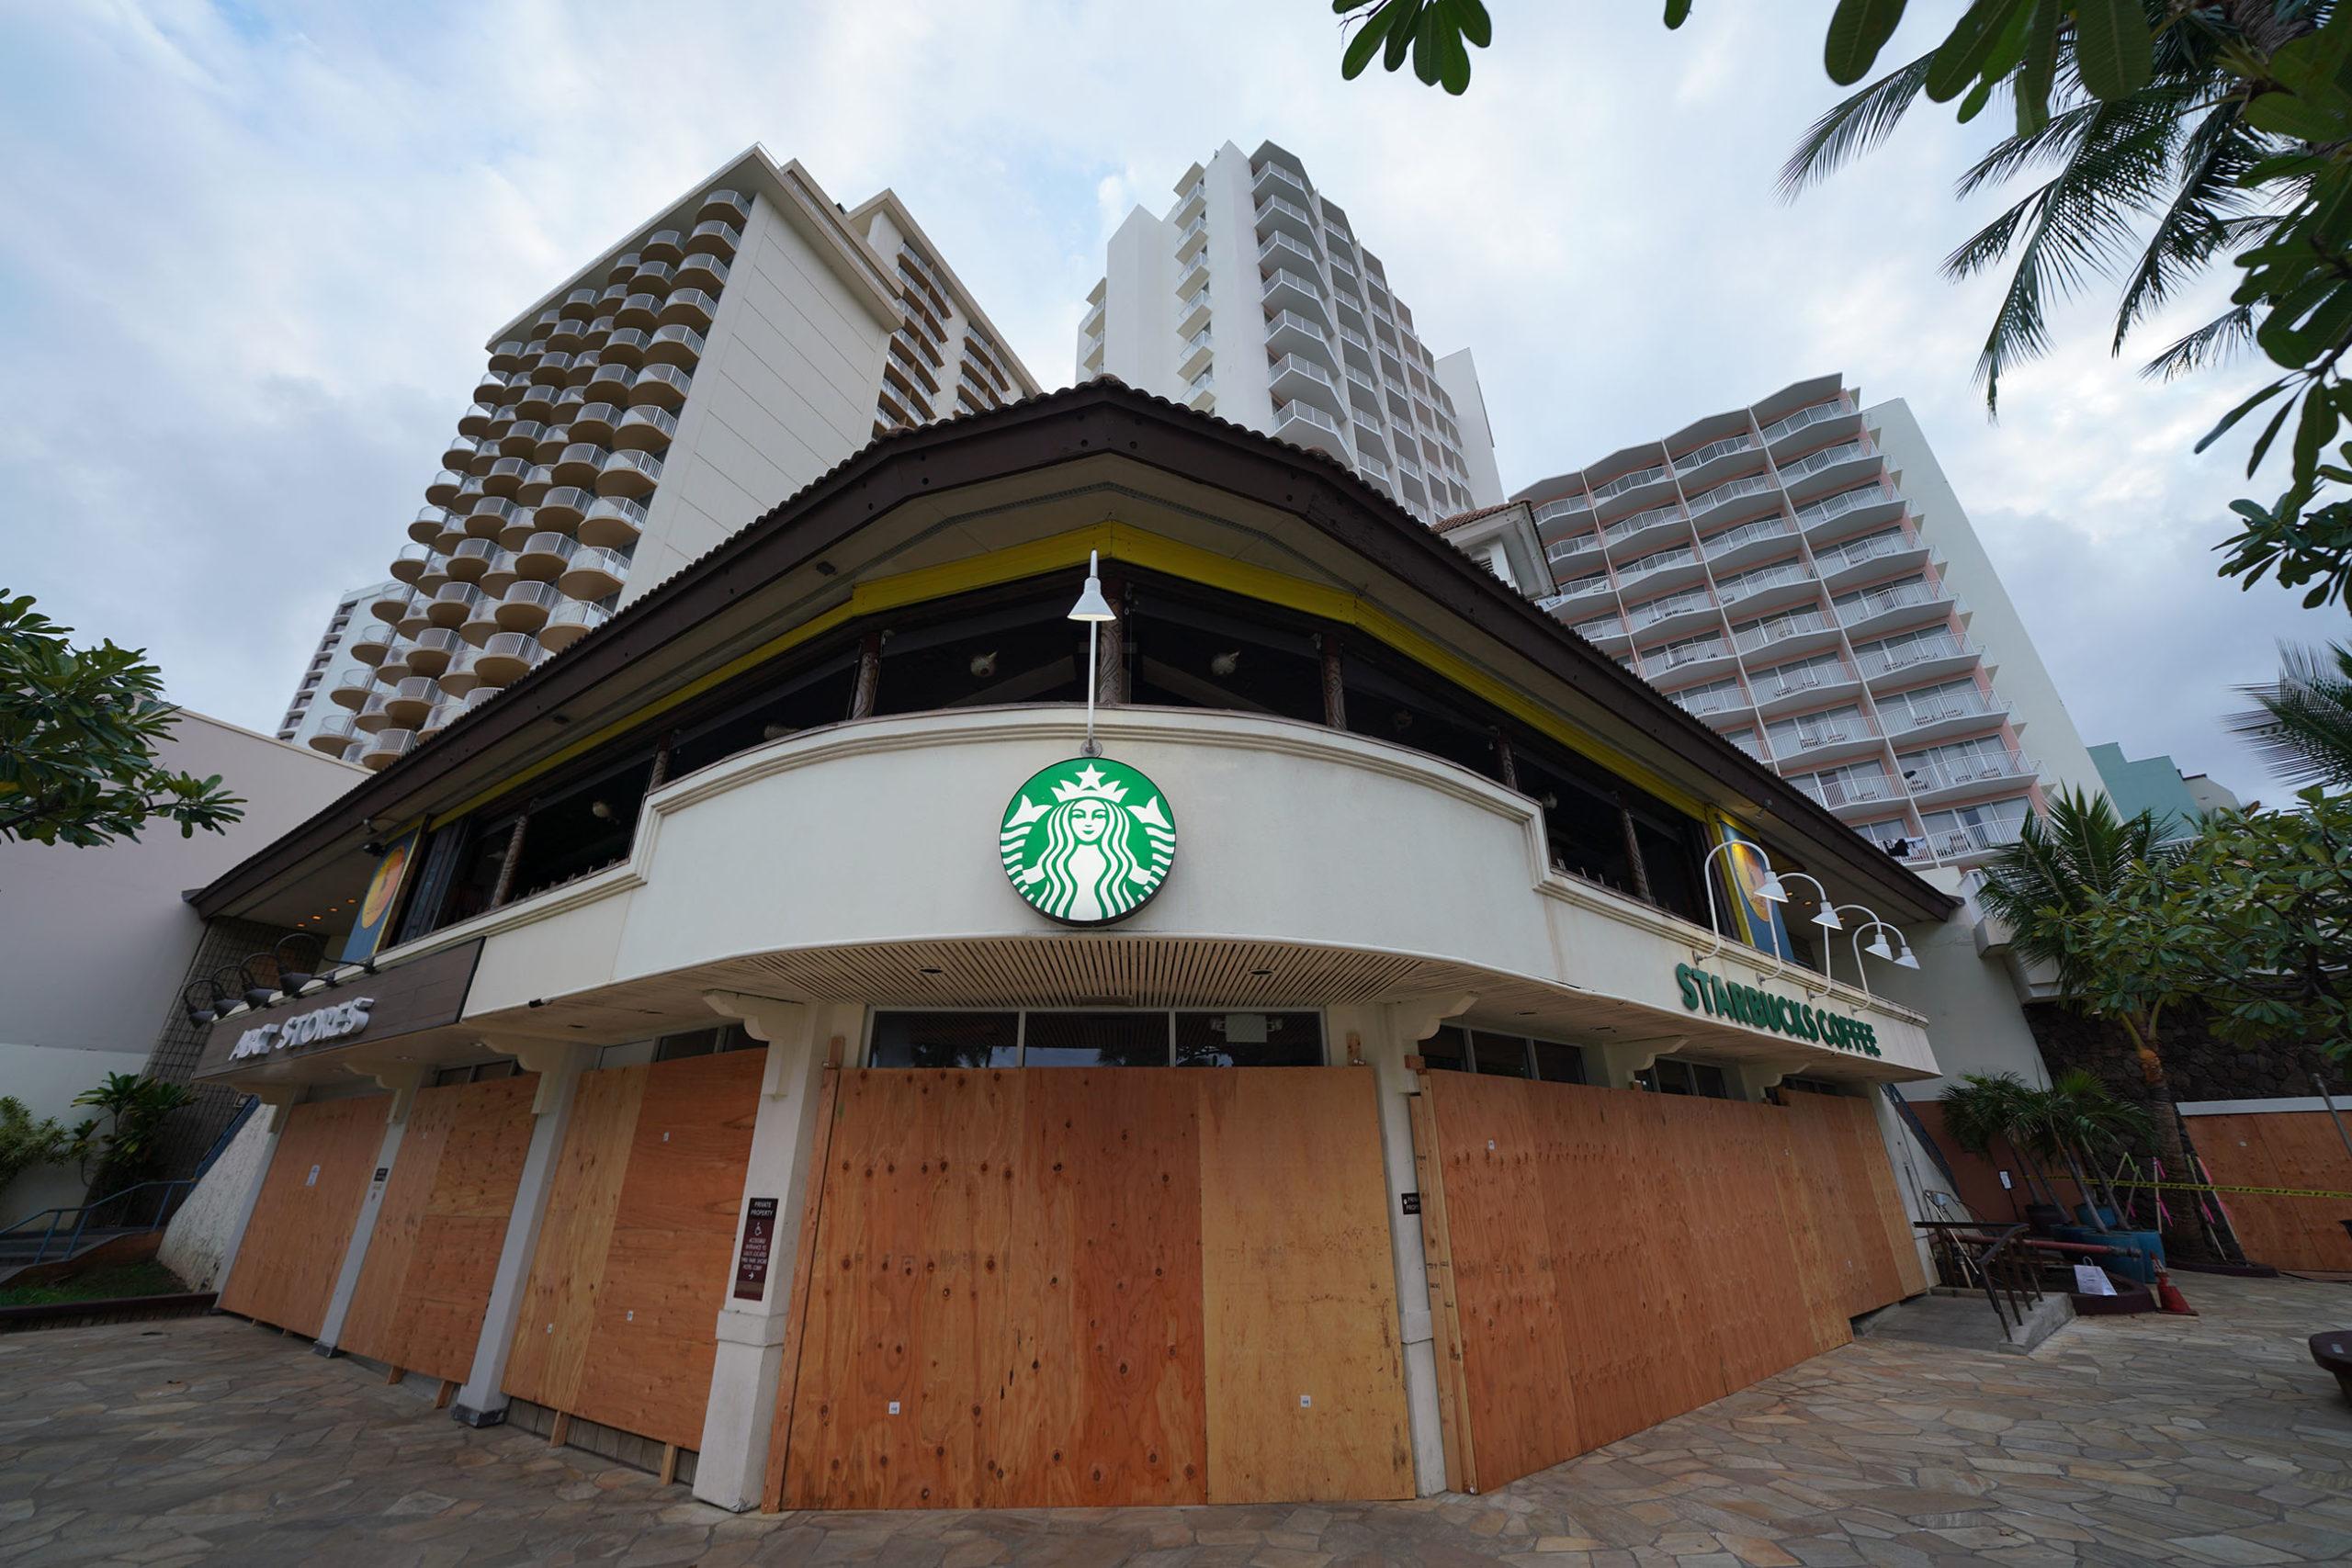 Waikiki COVID19 Coronavirus Starbucks Coffee boarded up 2020 - Honolulu Civil Beat